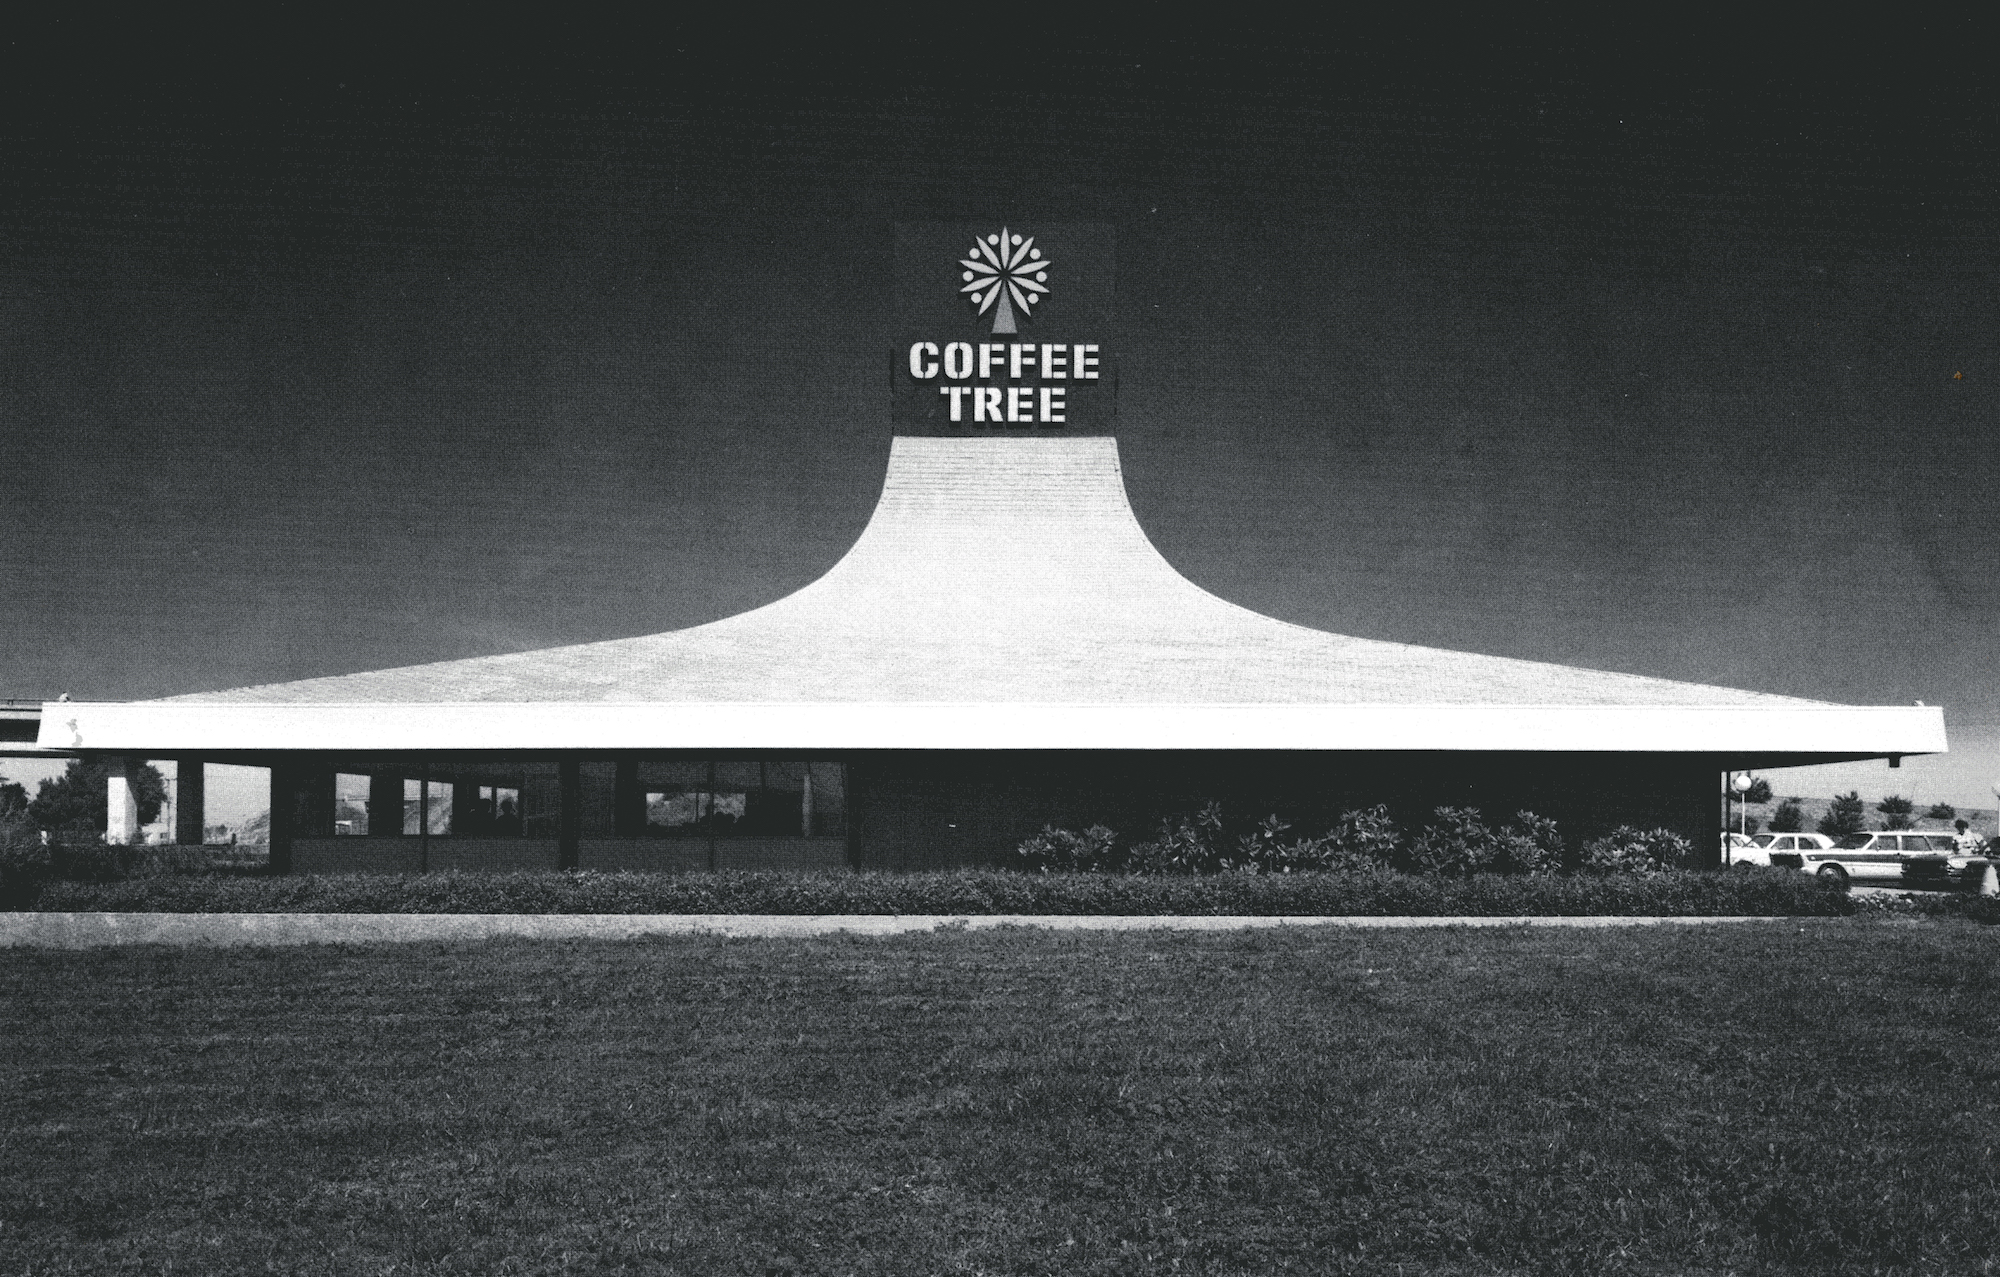 Db2 571 Coffee Tree Restaurant, 1965